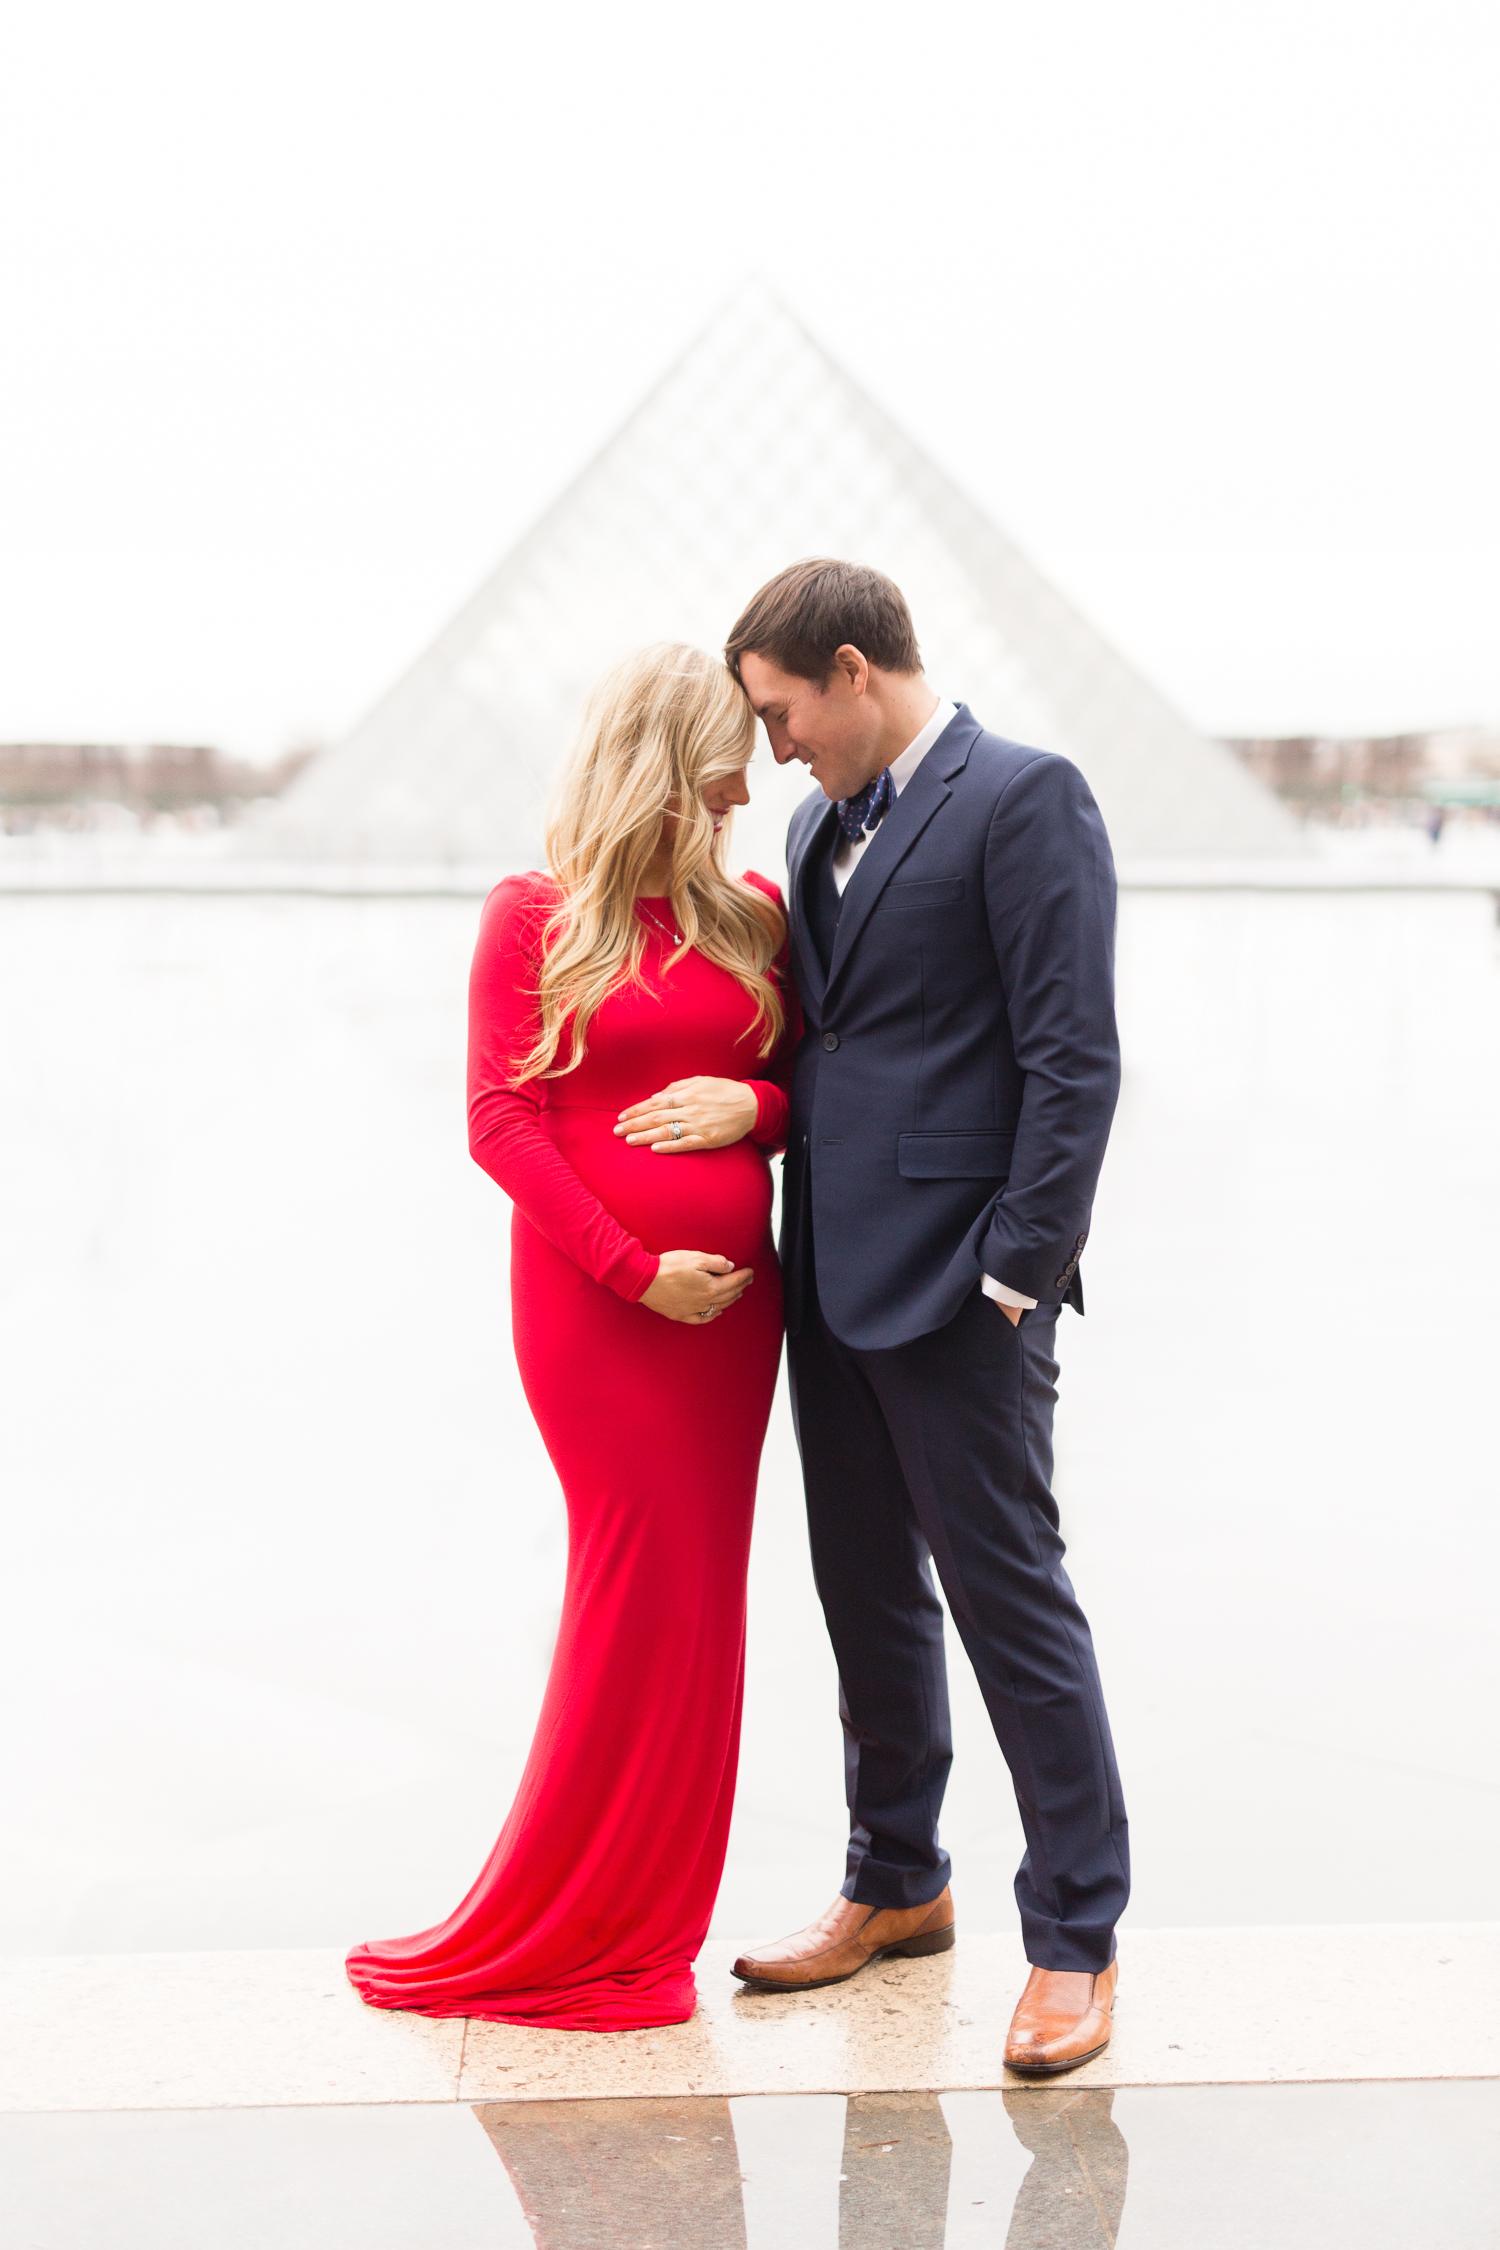 paris-maternity-photographer-katie-donnelly-blogger-chloe-arnold-palais-royal-louvre-8.jpg